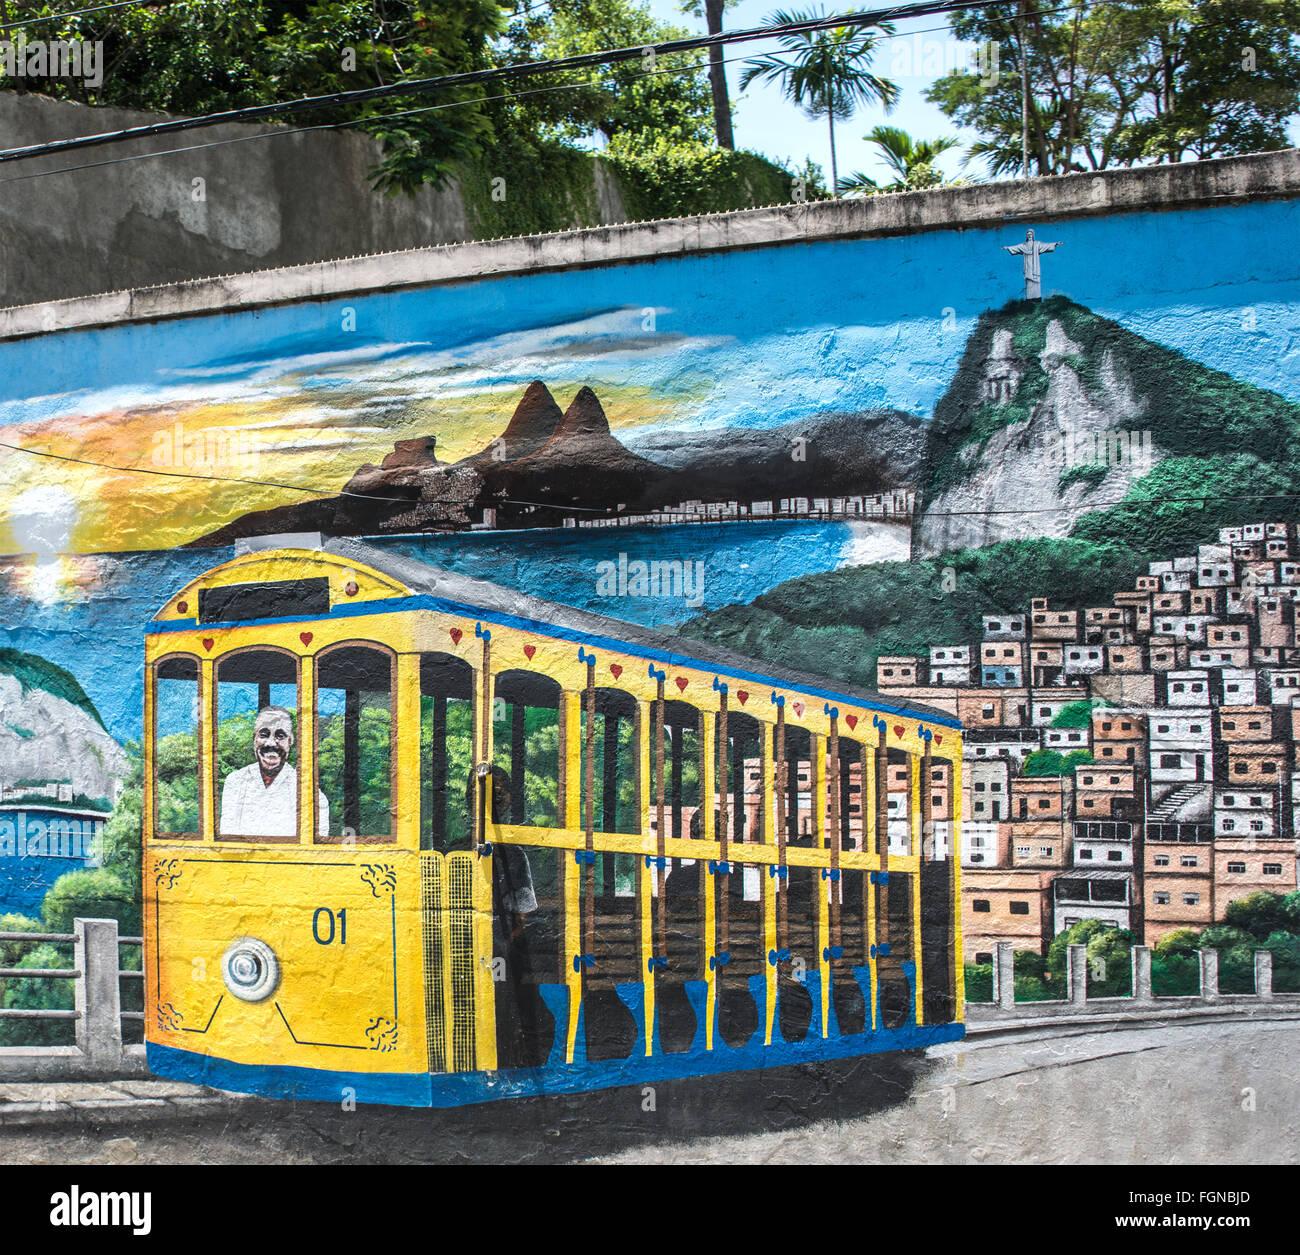 Bunte Straße Kunst Im Stadtteil Santa Teresa Rio De Janeiro